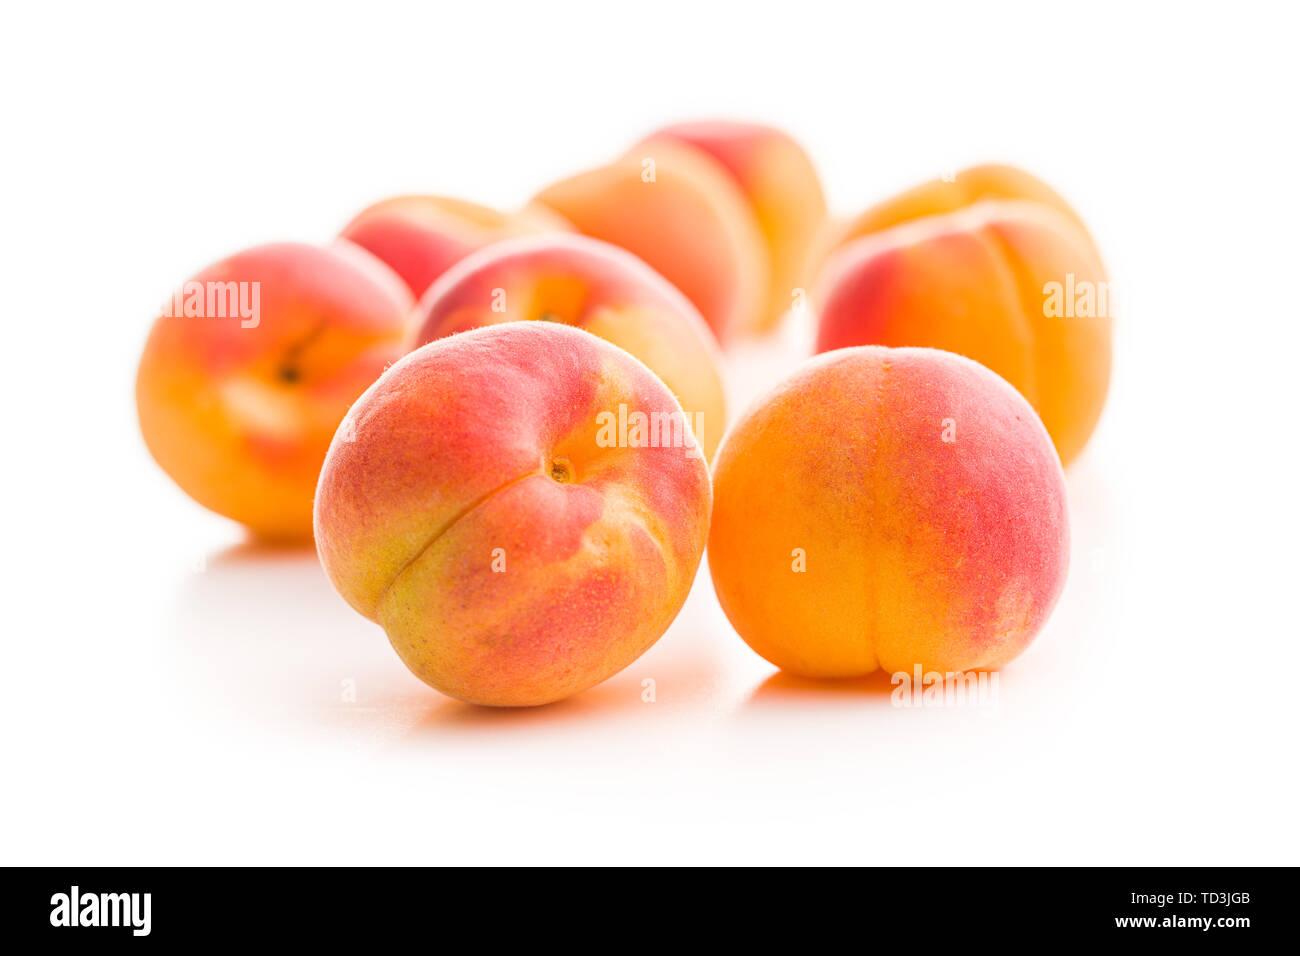 Sweet apricot fruits isolated on white background. - Stock Image